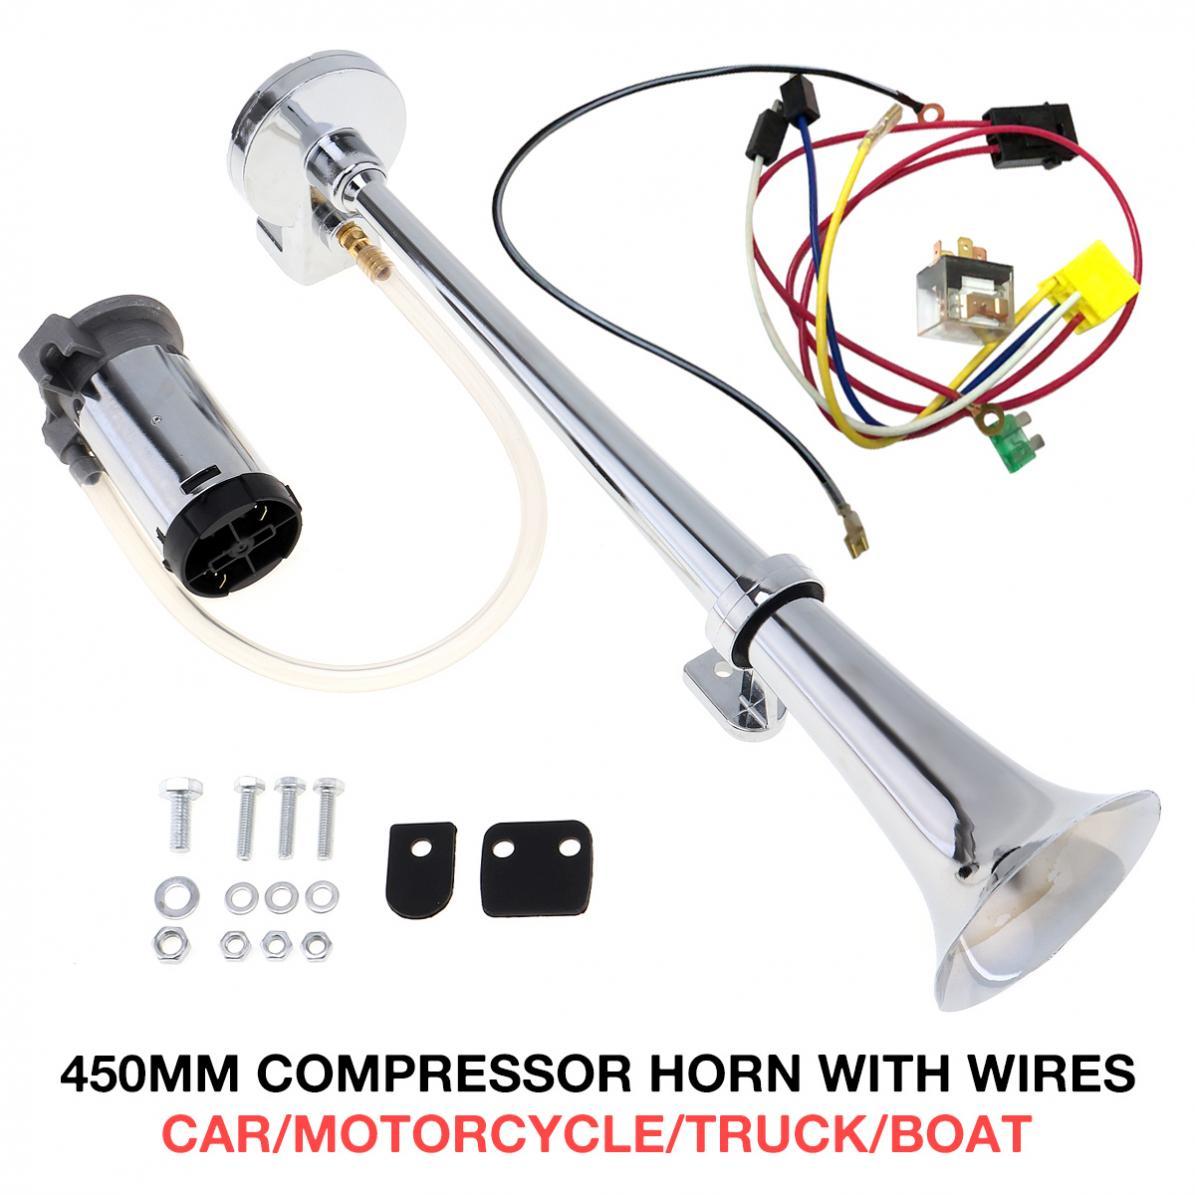 17 Inch 12V/24V 150DB Super Loud Single Car Trumpet Air Horn Compressor Car Horn Speaker Kit for Cars Trucks Boats Motorcycles